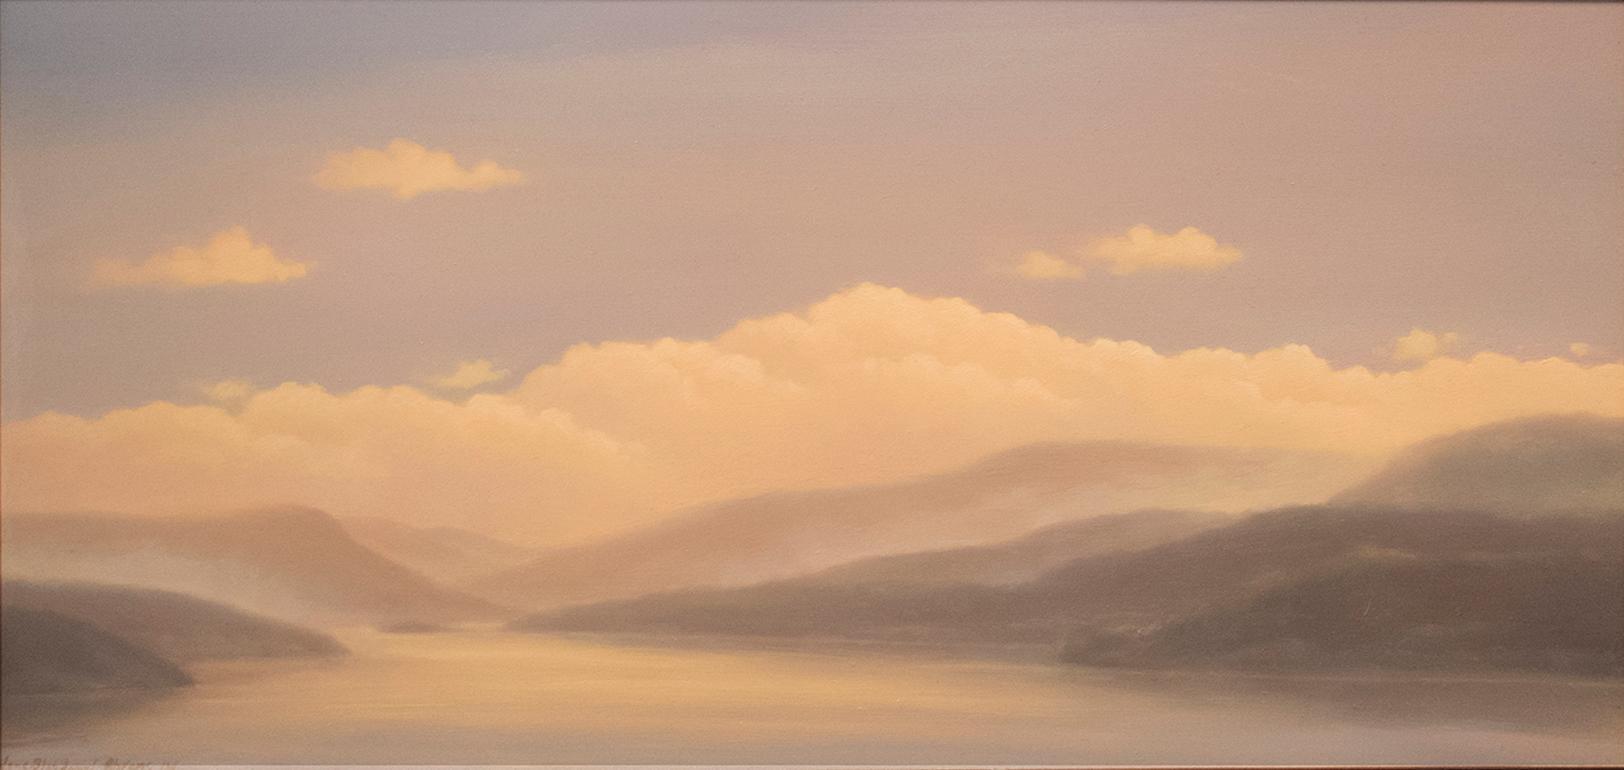 Mist Rising on the Hudson (Landscape of the Hudson Valley)